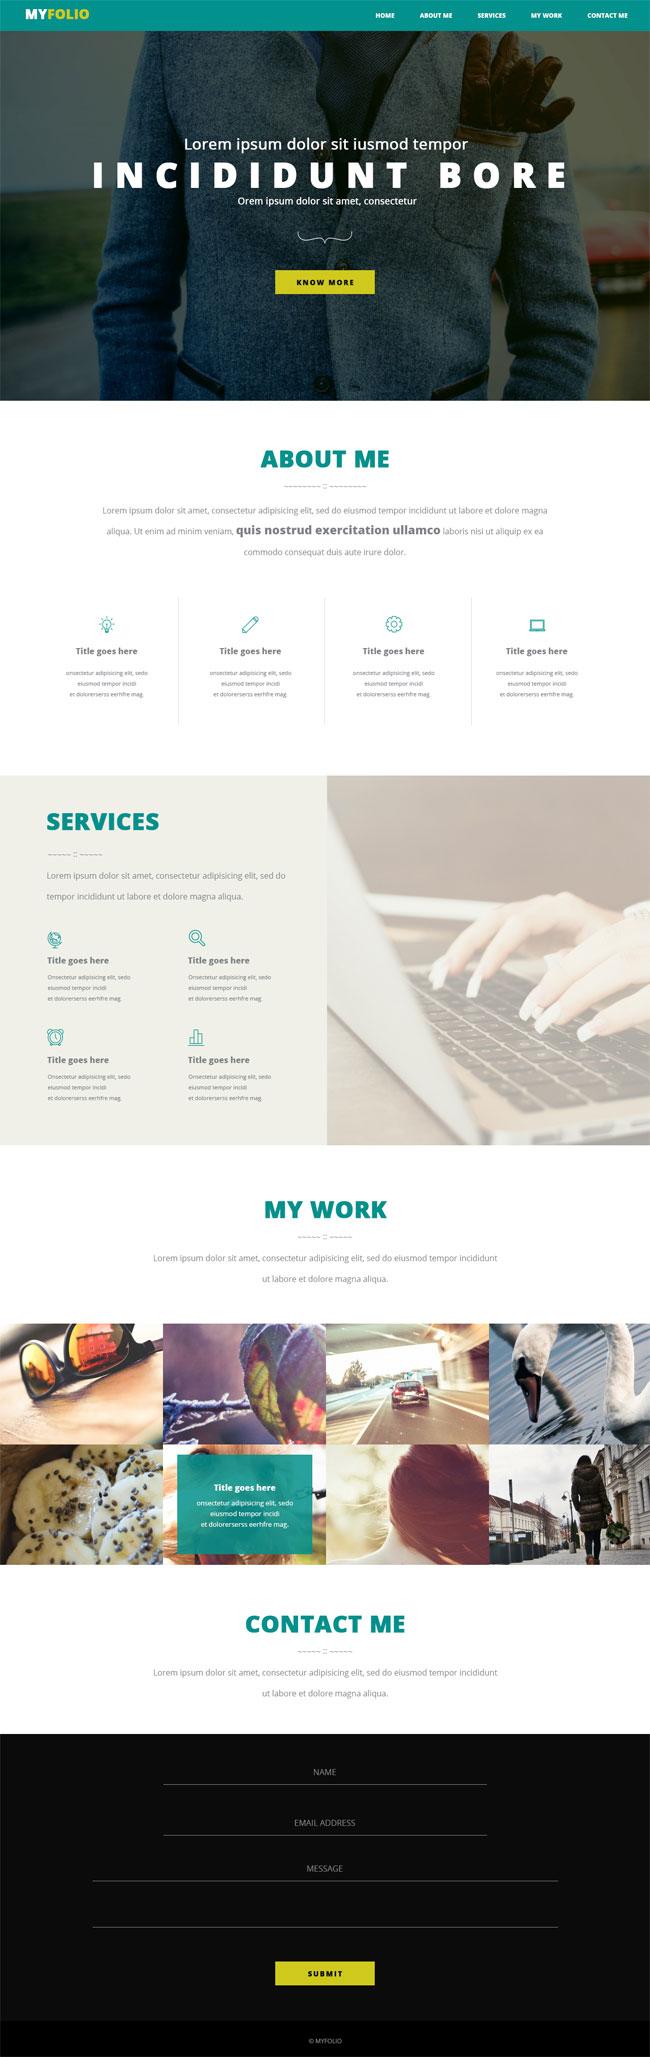 MYFOLIO - Free One Page Portfolio PSD Template